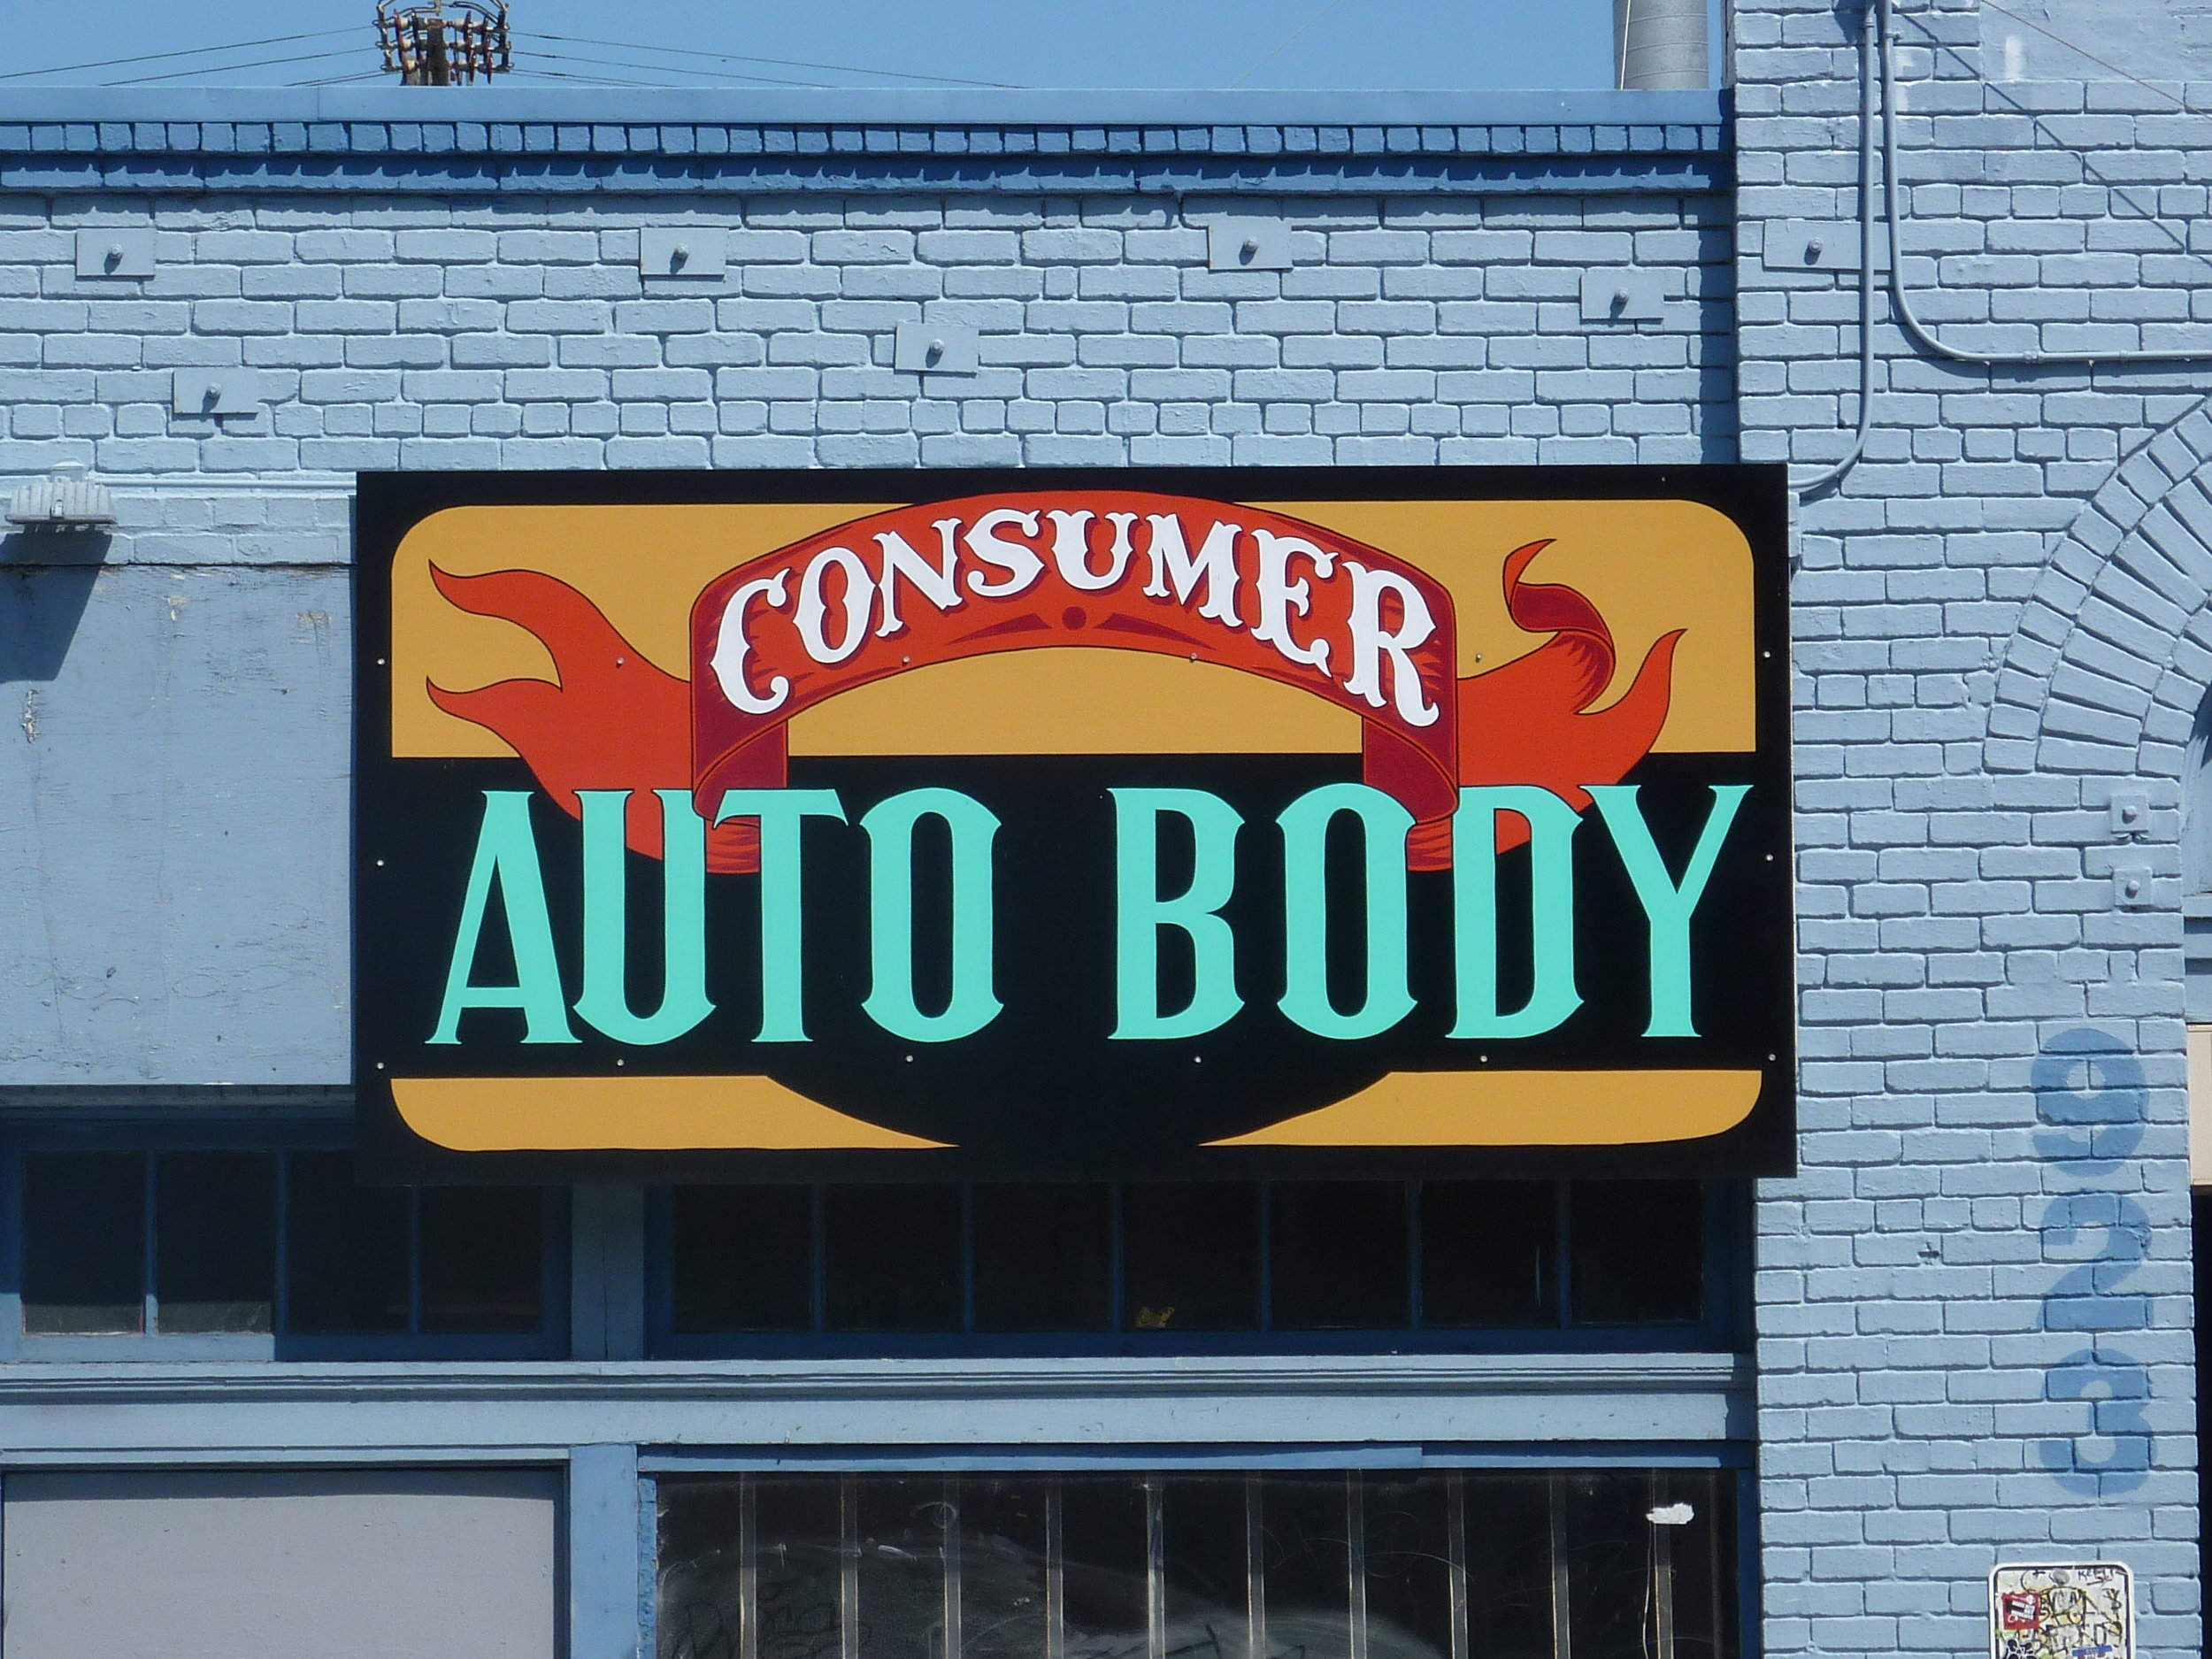 ORIG-consumer-auto-body_9666217335_o.jpg